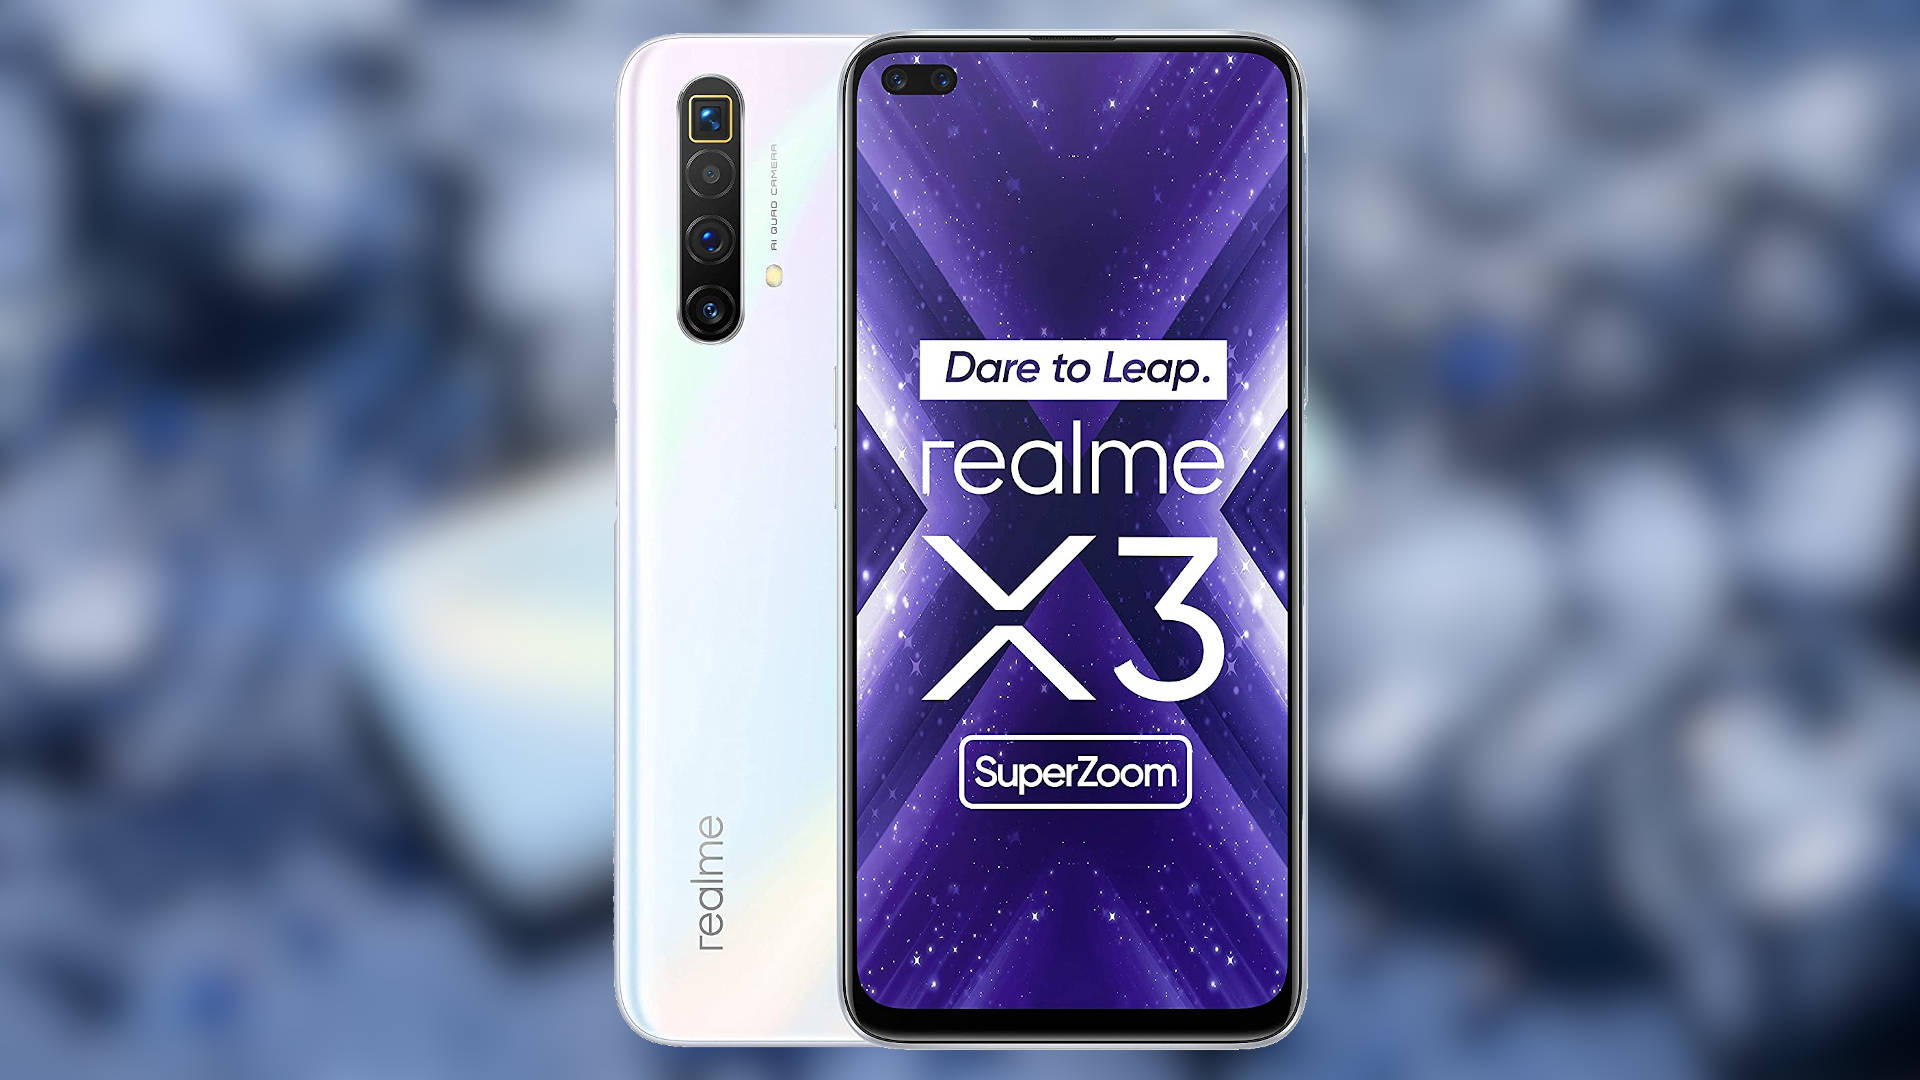 Realme X3 SuperZoom – Edwaybuy